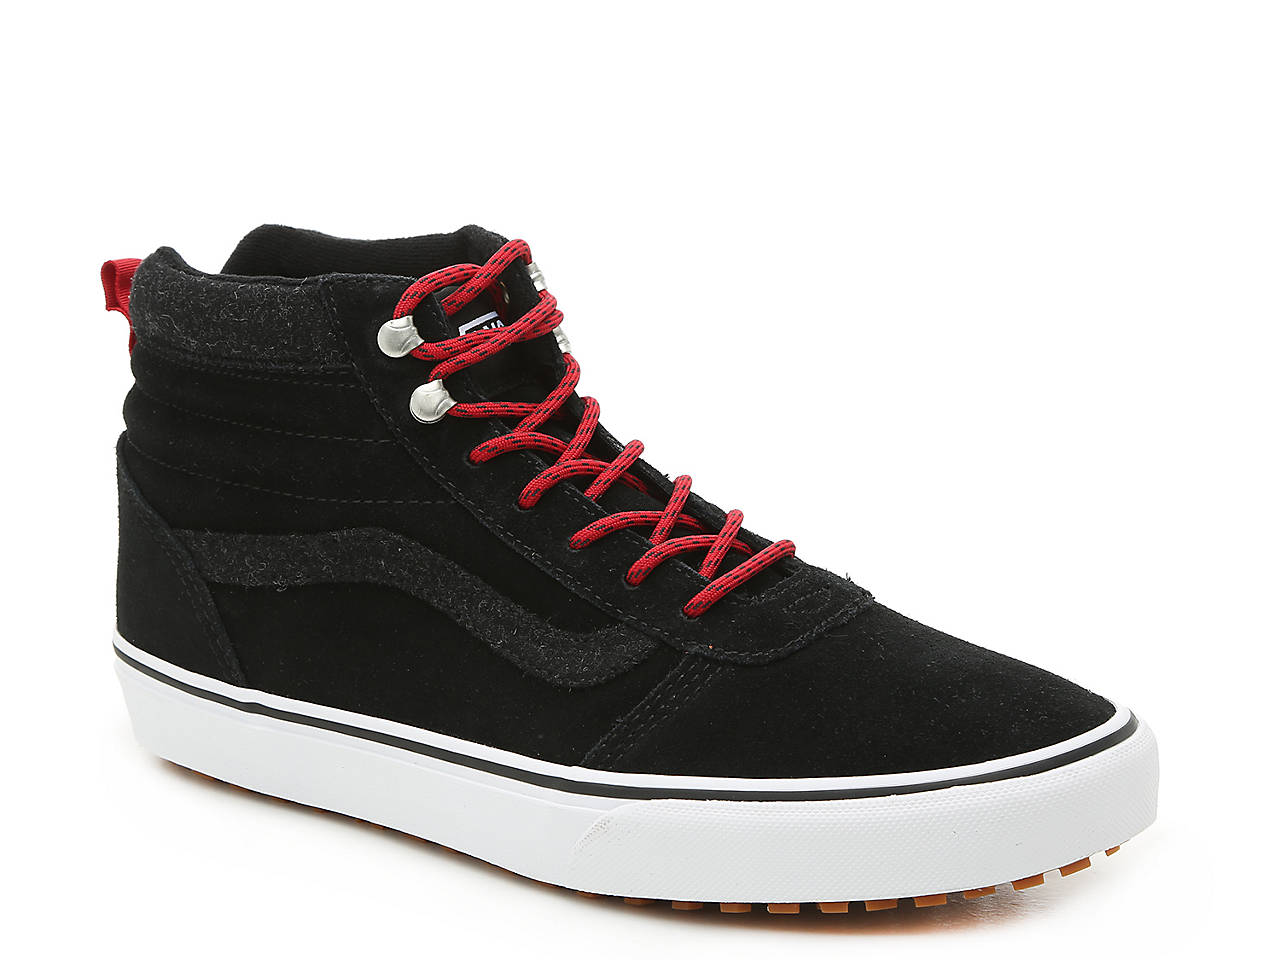 dac0be160e Vans Ward Hi MTE High-Top Sneaker - Men s Men s Shoes